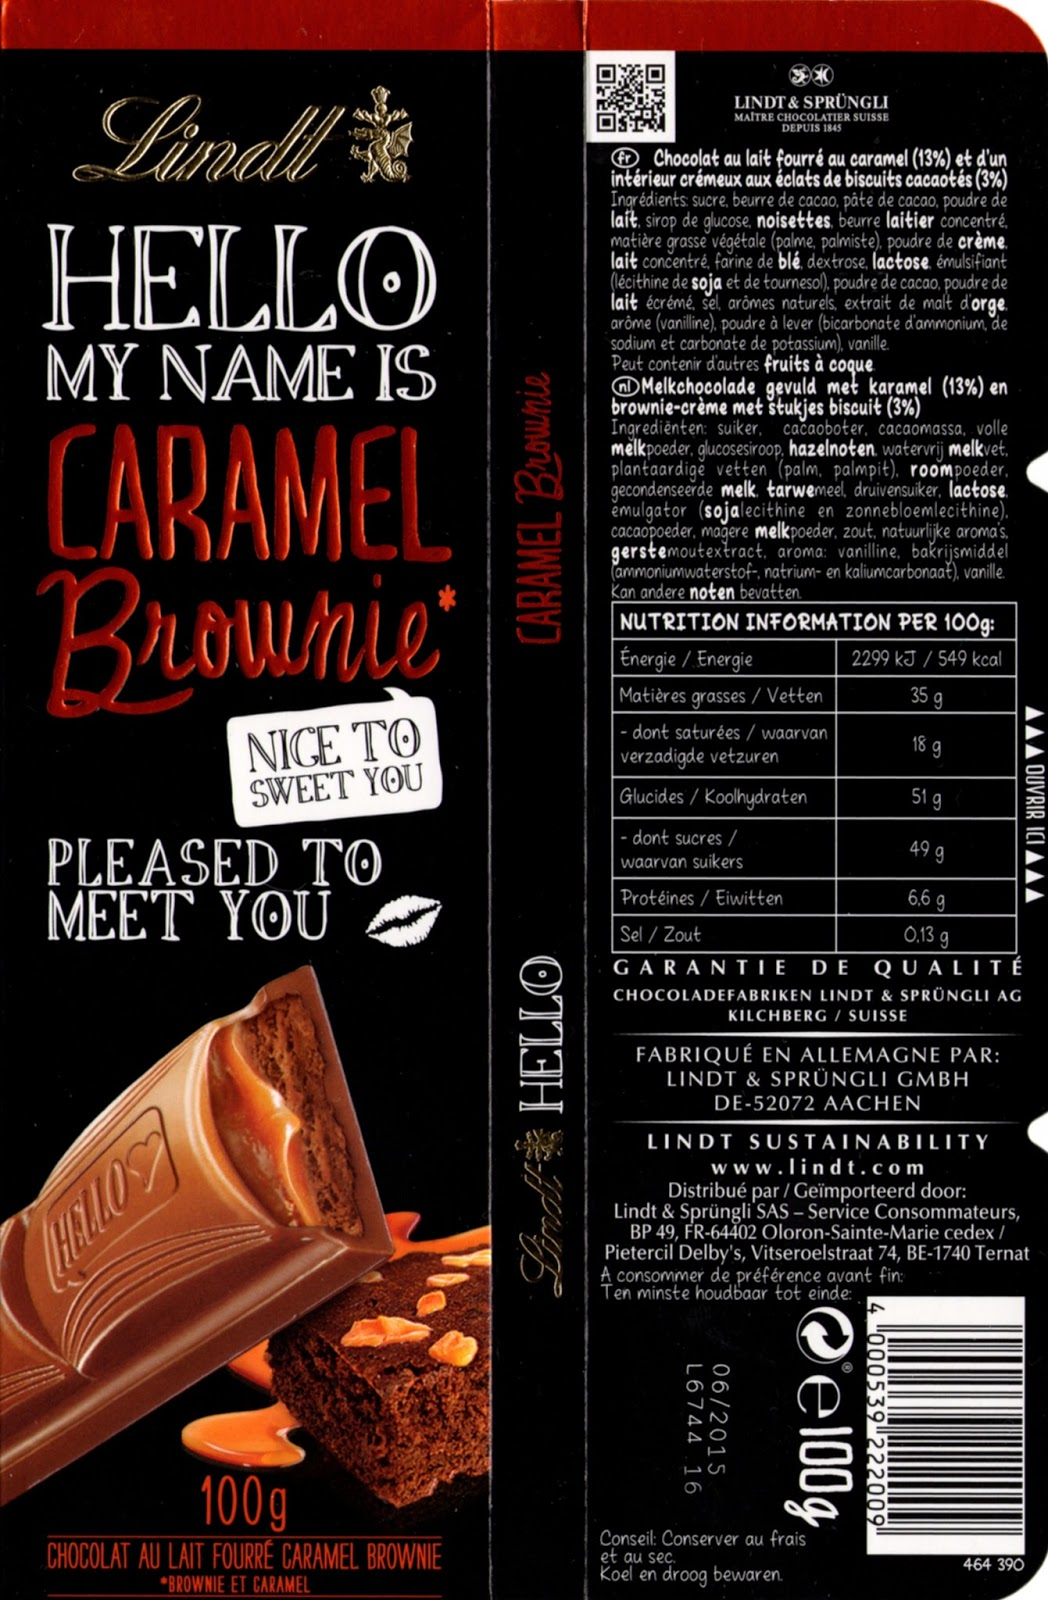 lindt hello my name is caramel brownie tablette de choc. Black Bedroom Furniture Sets. Home Design Ideas